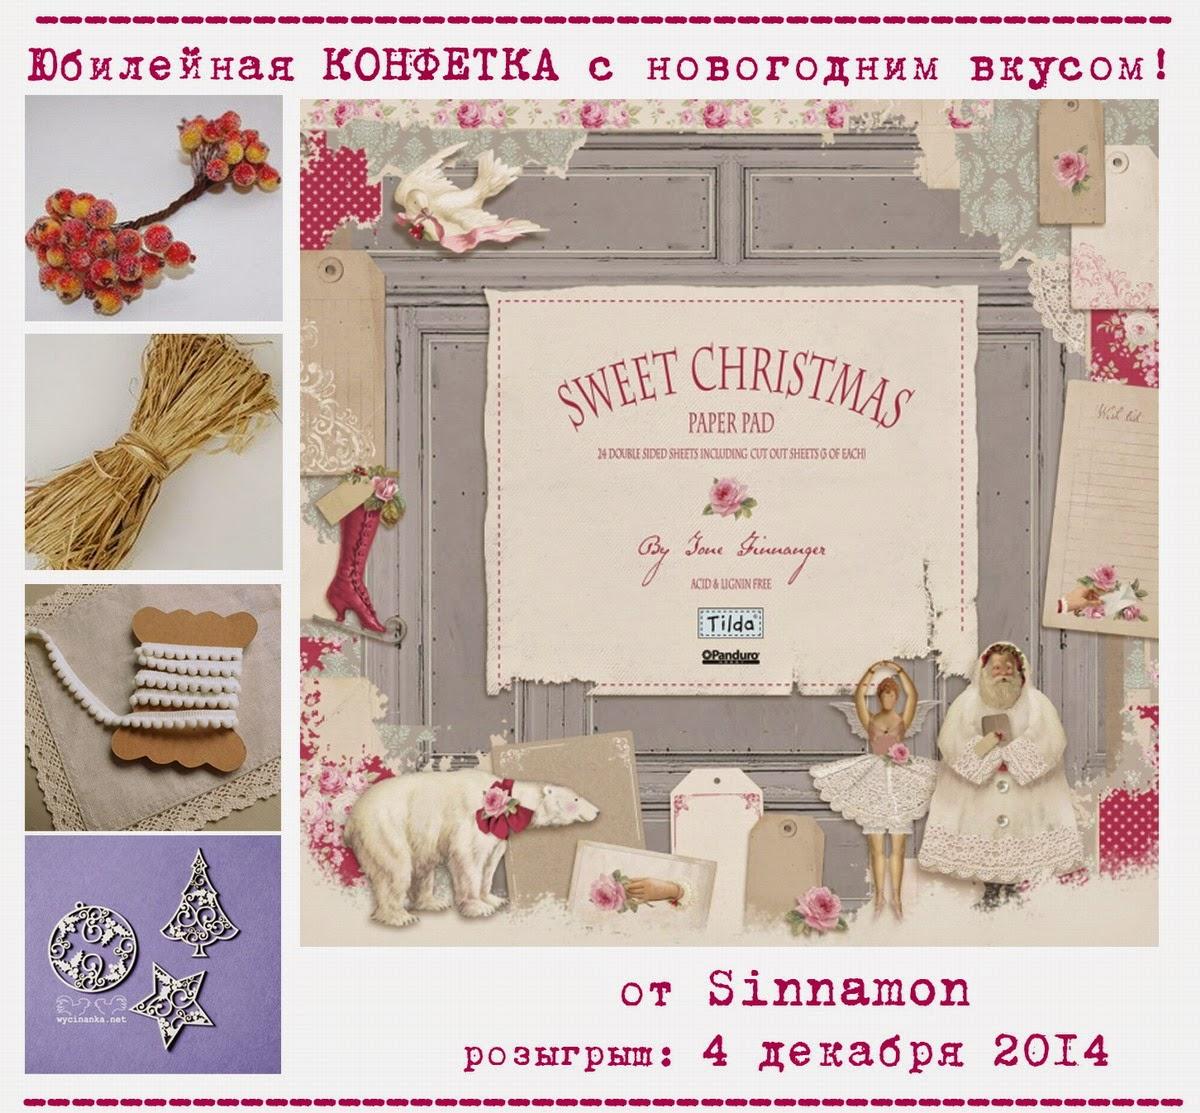 Конфетка от Sinnamon до 4 декабря